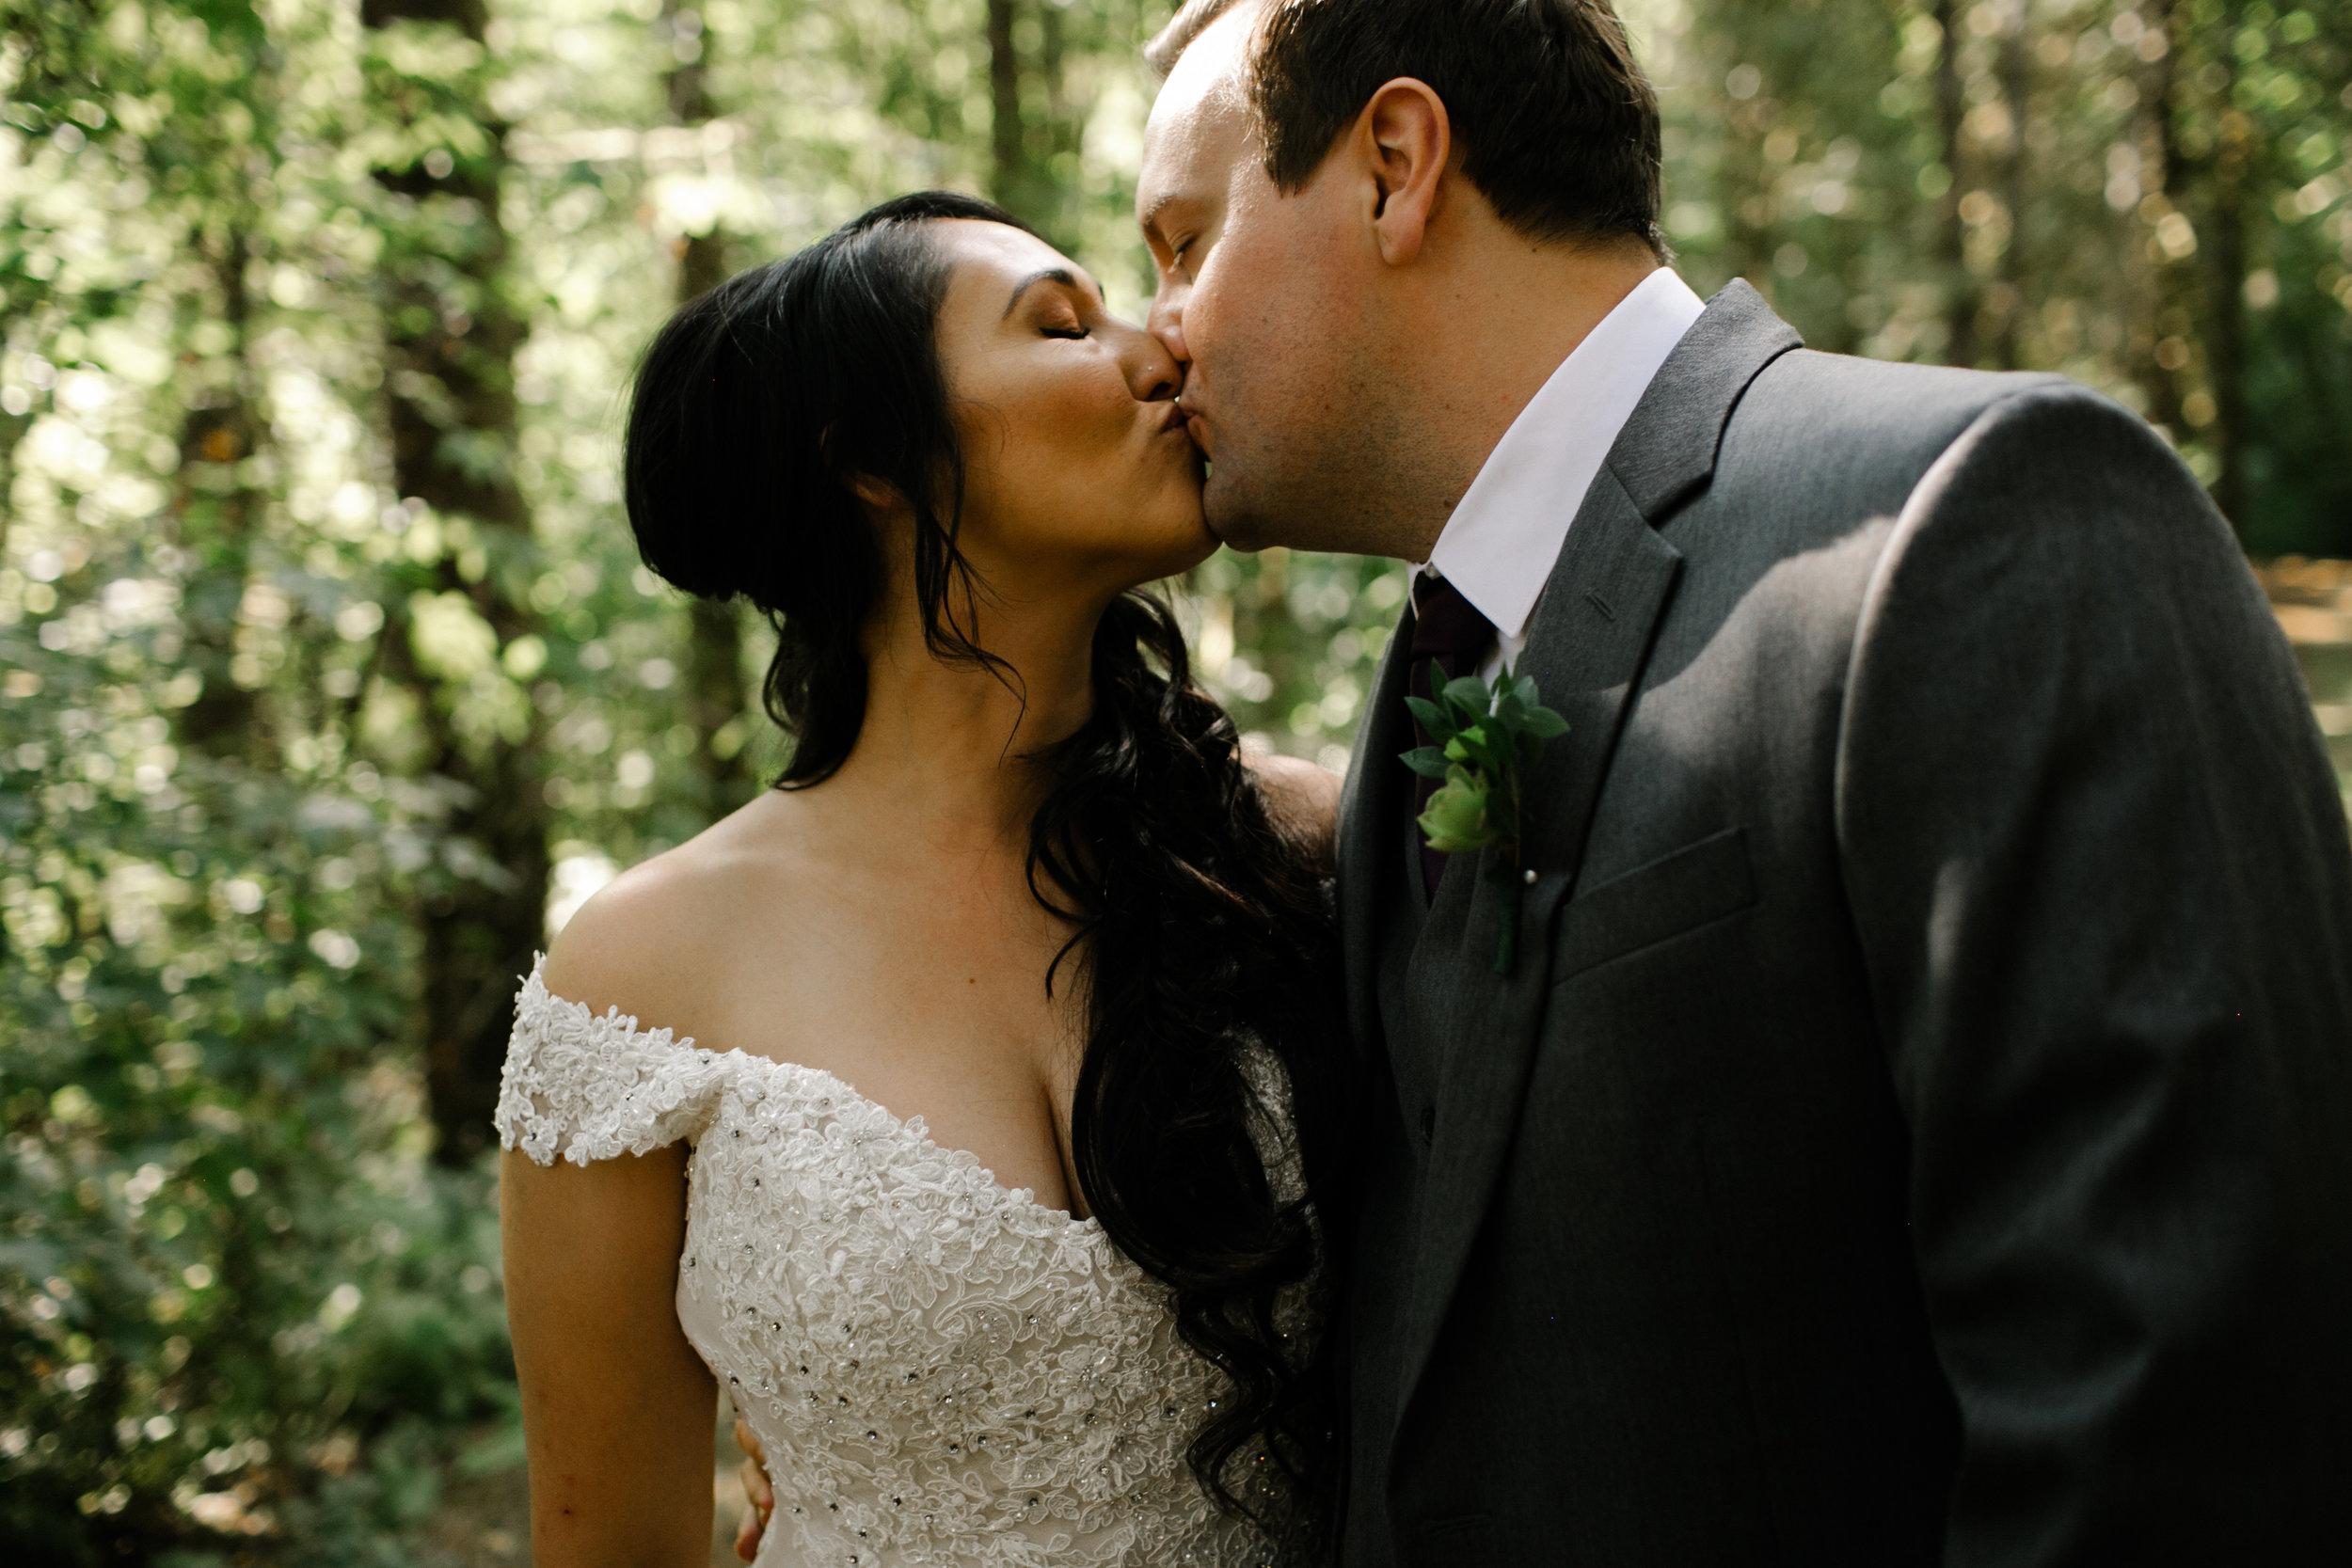 Sevlynn-Photography-Teresa-Chandler-Wedding-16.jpg